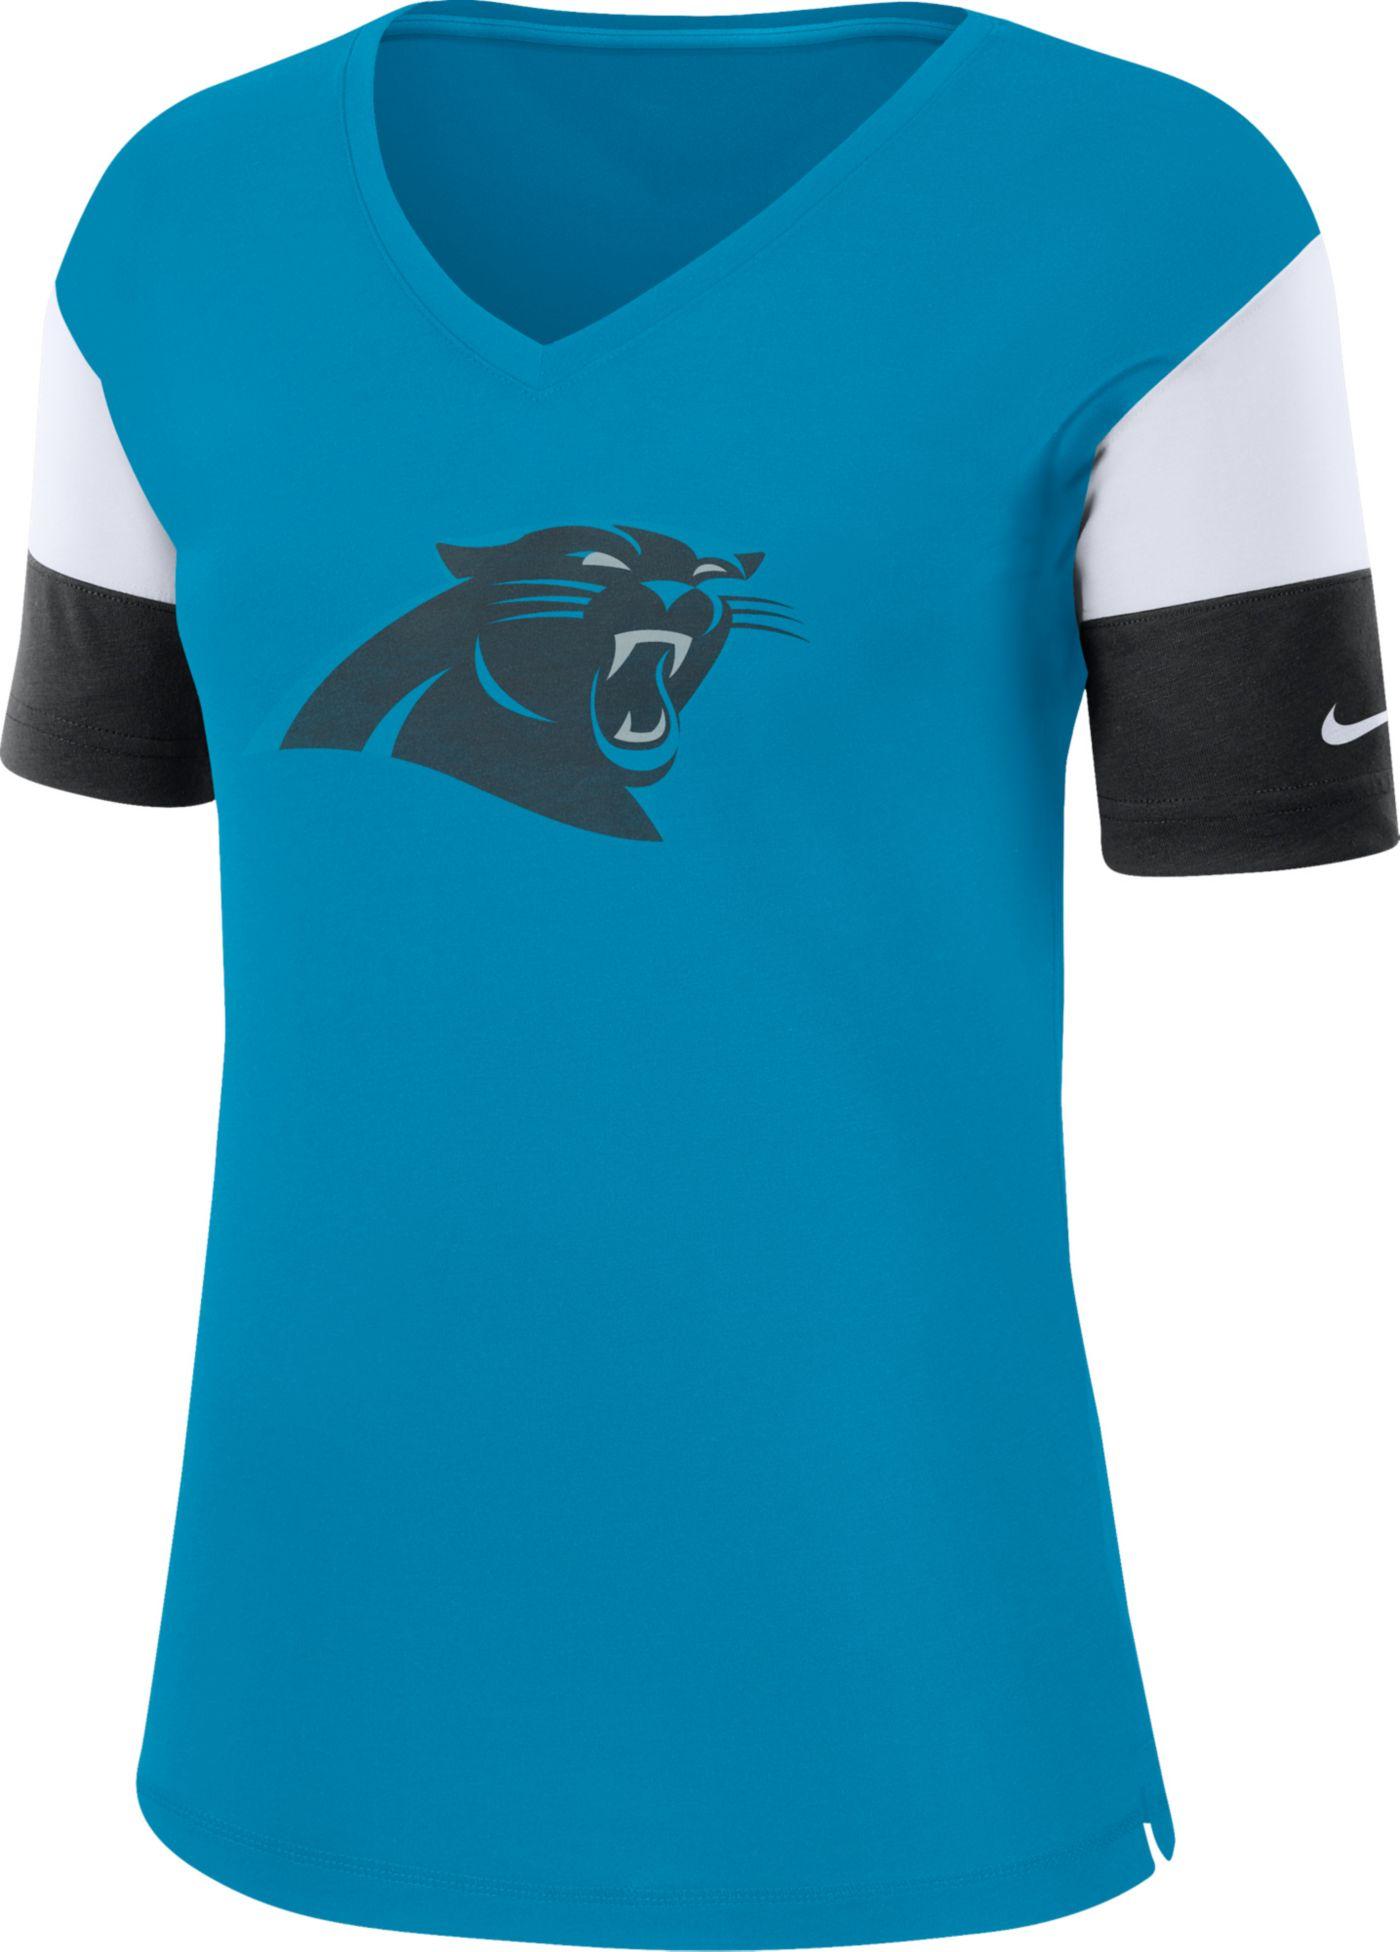 Nike Women's Carolina Panthers Breathe Blue V-Neck T-Shirt